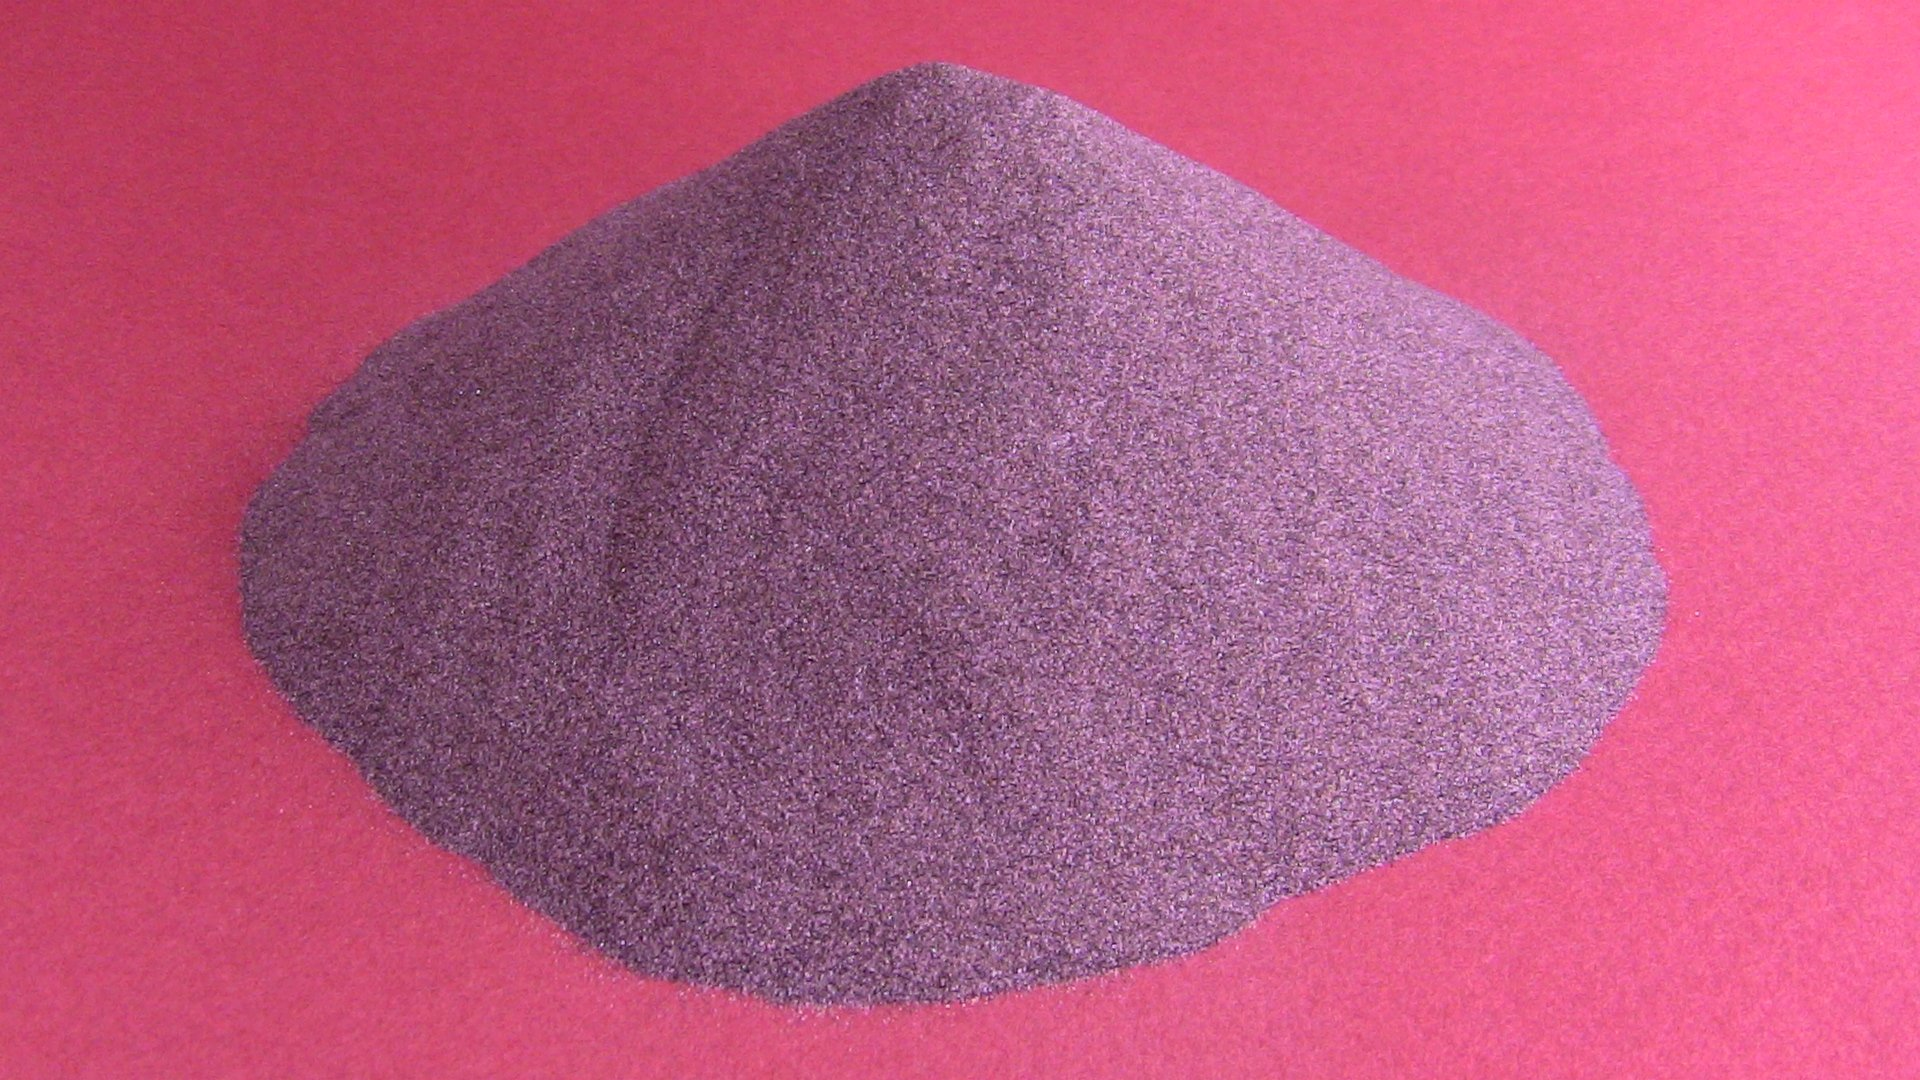 ALUMINUM OXIDE #120 - Fine Abrasive - 25 lbs - Sand Blast Cabinet BLASTING MEDIA - by Tacoma Company